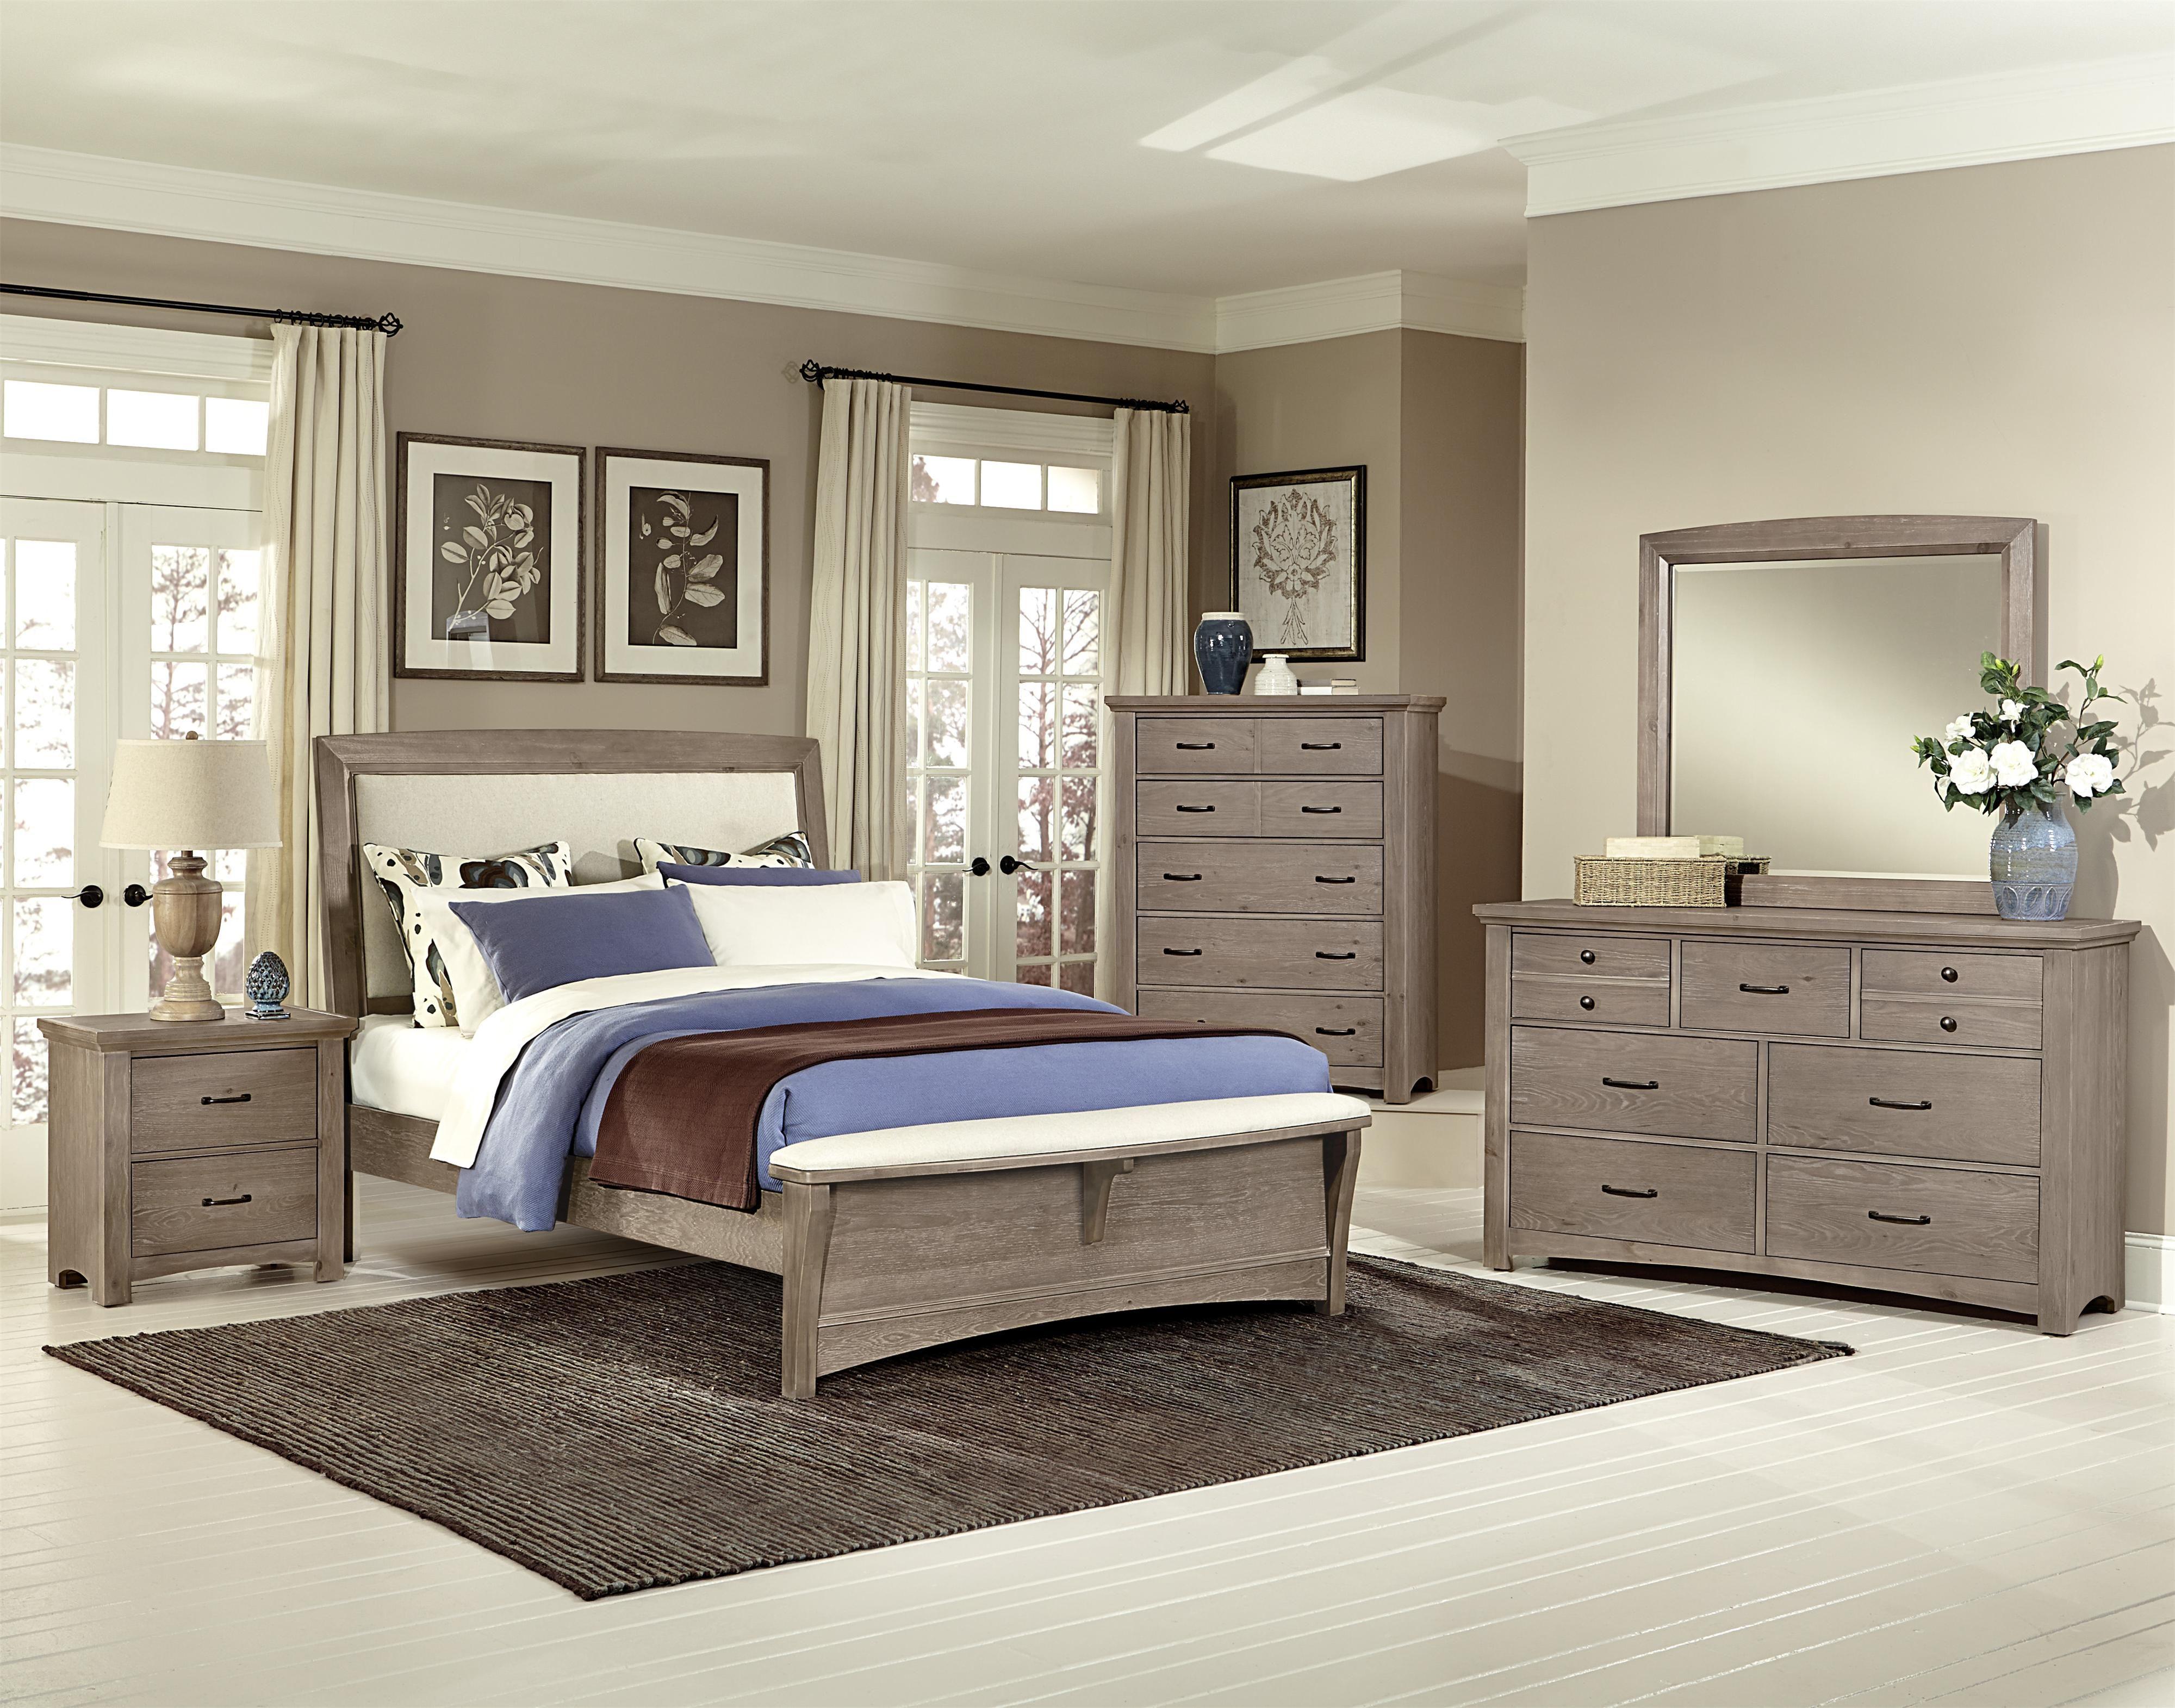 Transitions Queen Bedroom Group By Vaughan Bassett King Bedroom Sets Bedroom Set Upholstered Bedroom Set